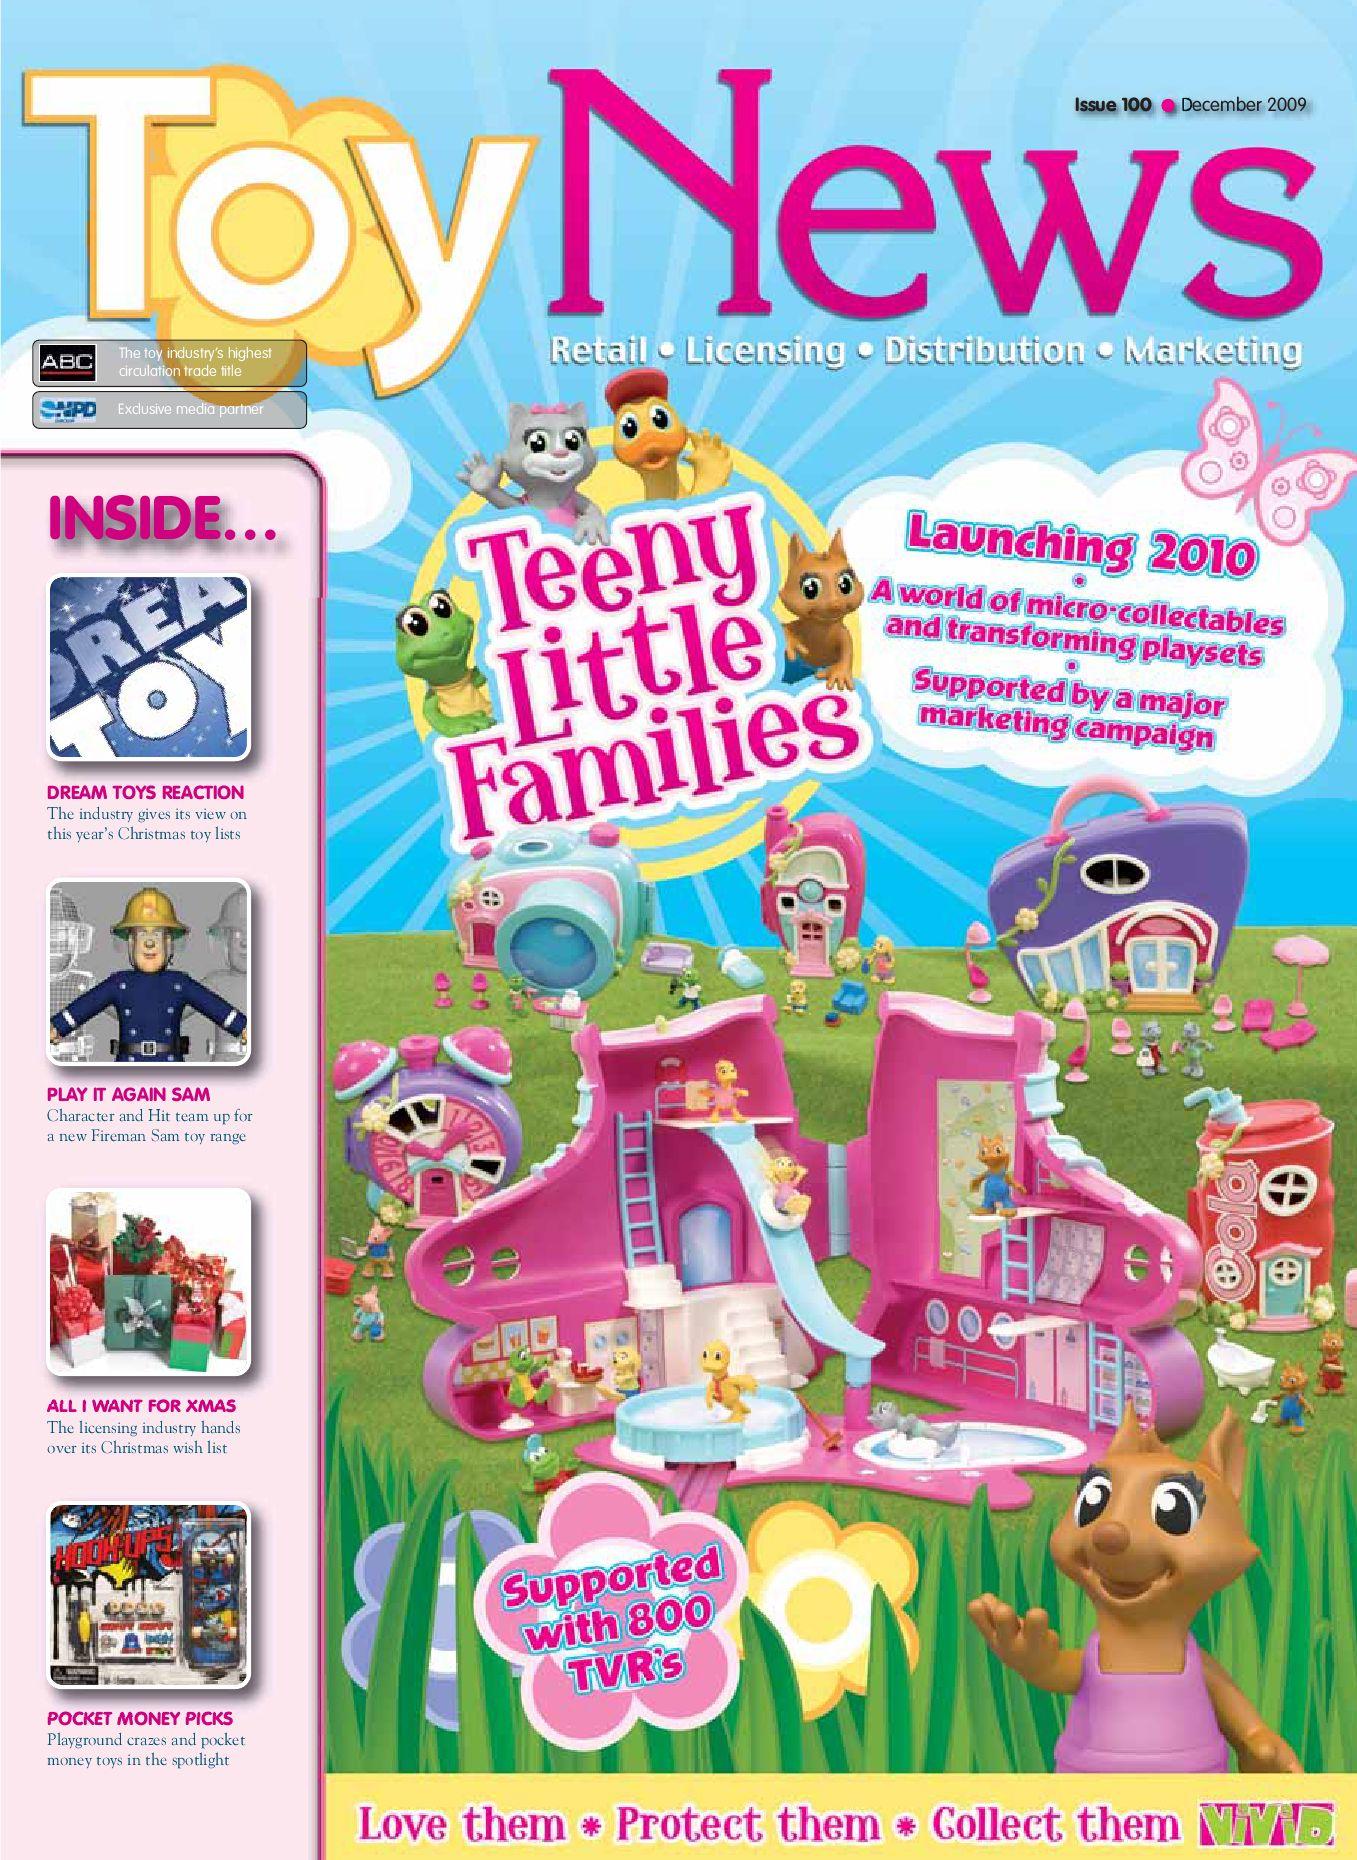 Toynews Issue 100 December 2009 By Intent Media Now Newbay Media  # Muebles Bima La Boyera